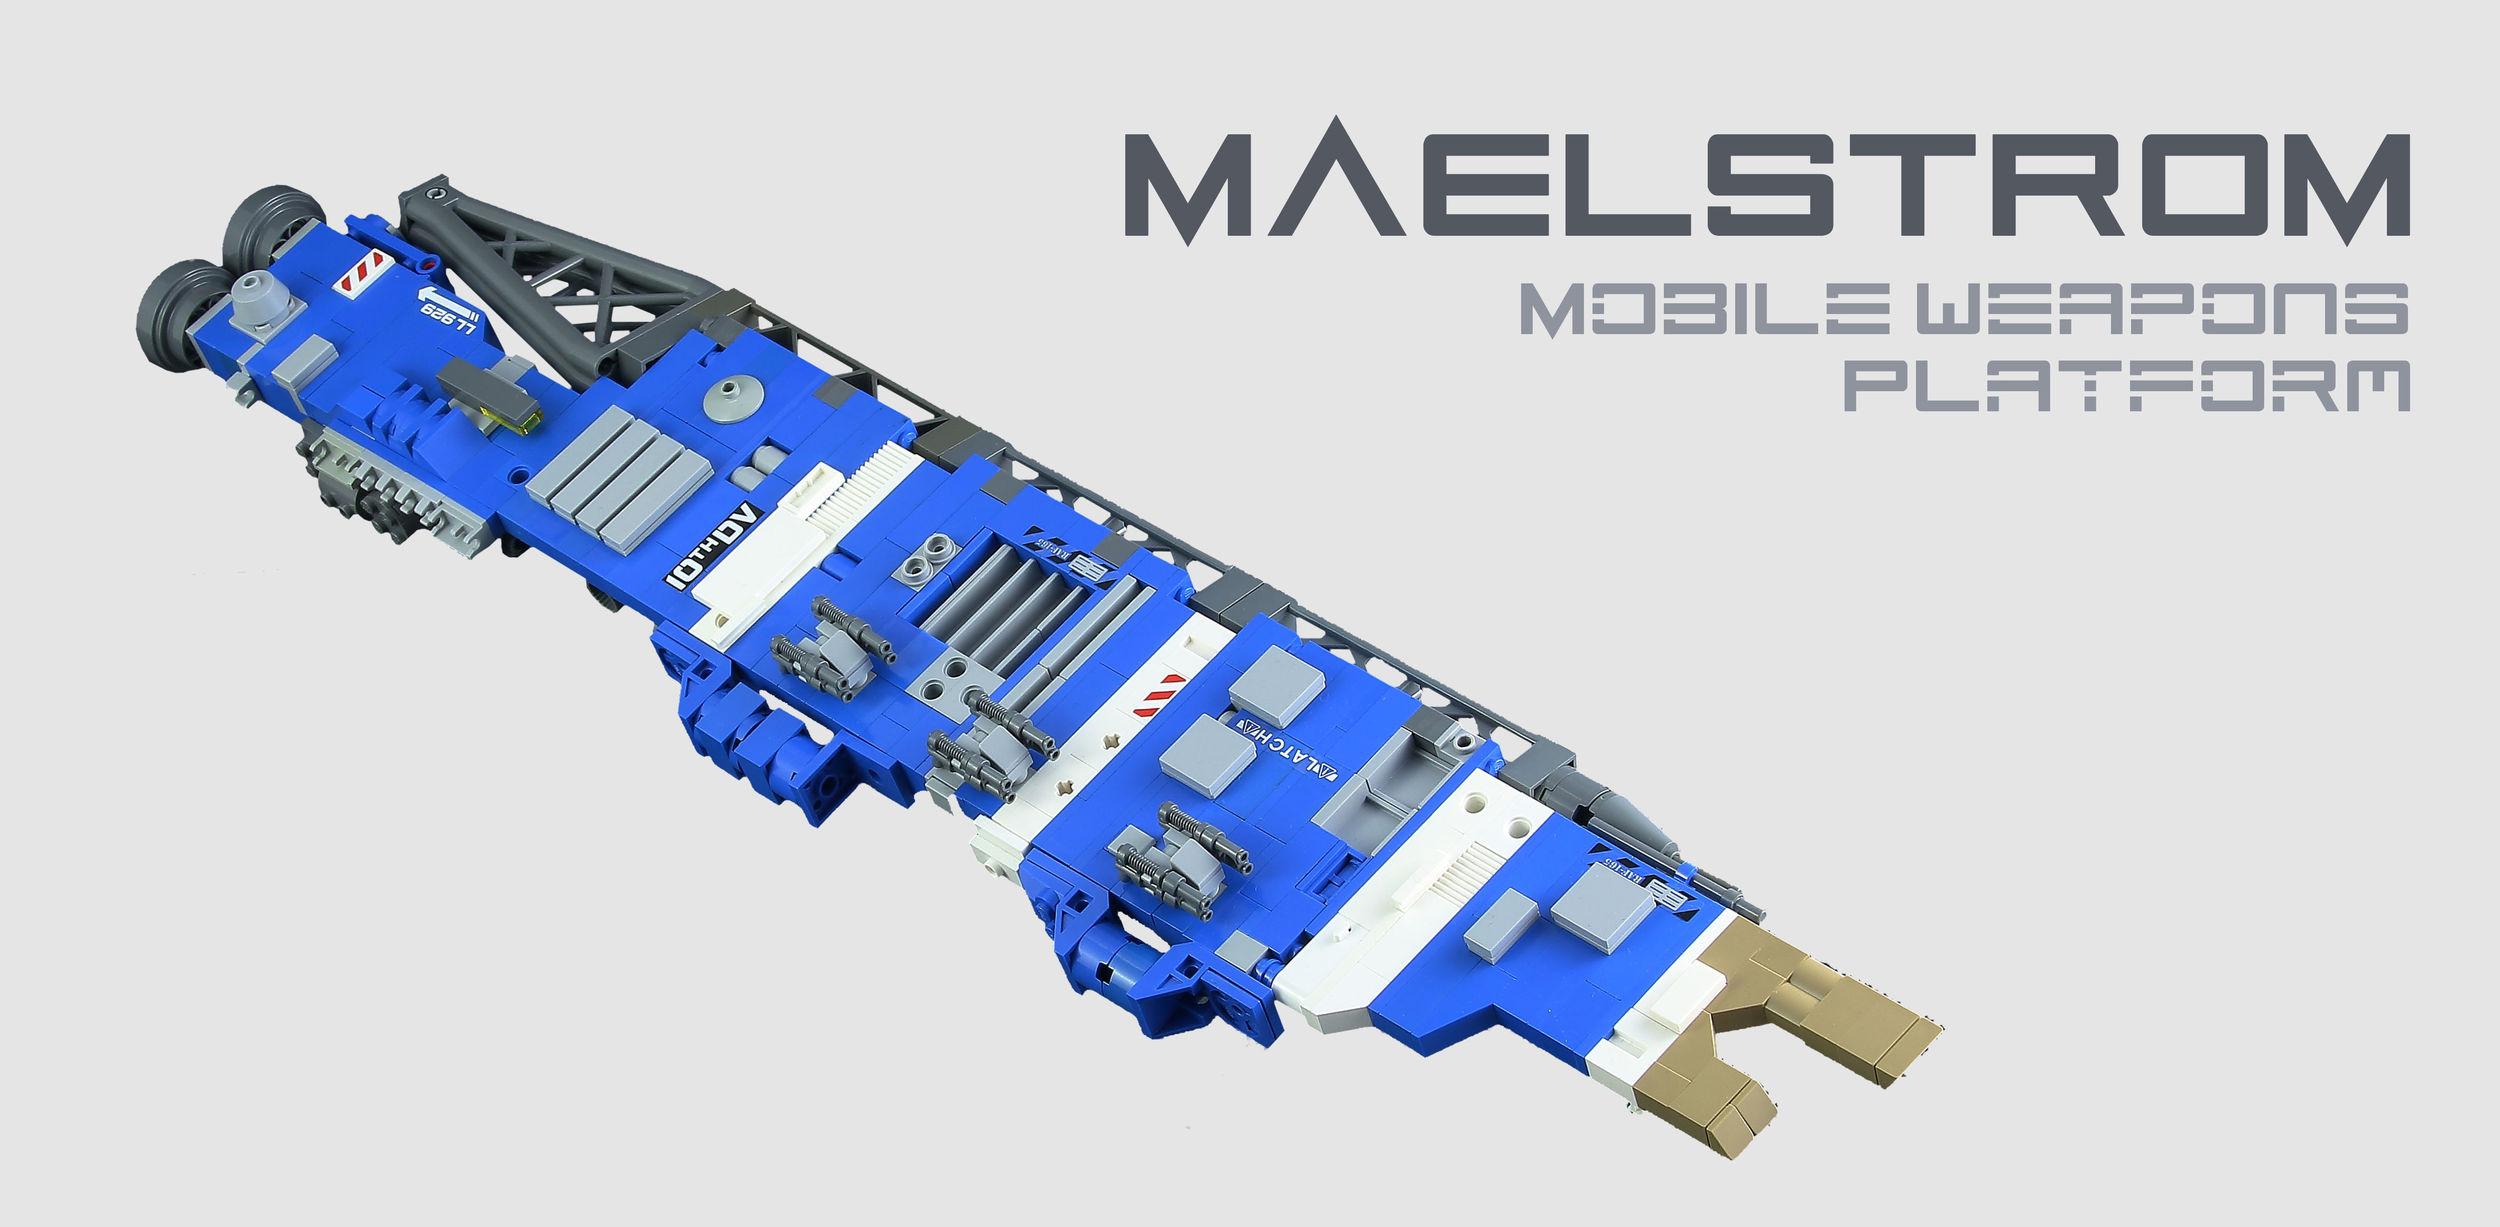 Maelstrom Mobile Weapons Platform.jpg